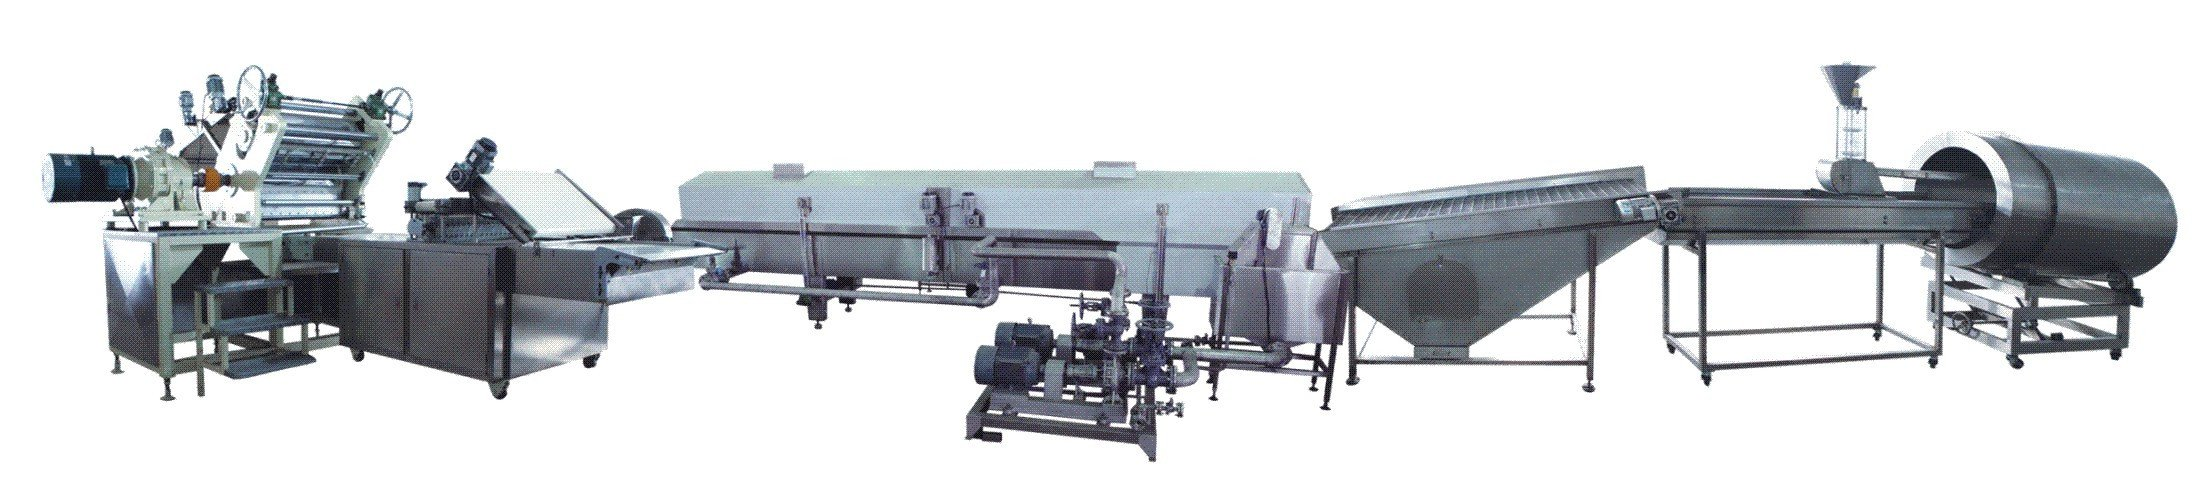 HANDYWARE potato corn tortilla maker machine manufacturer for trader-5